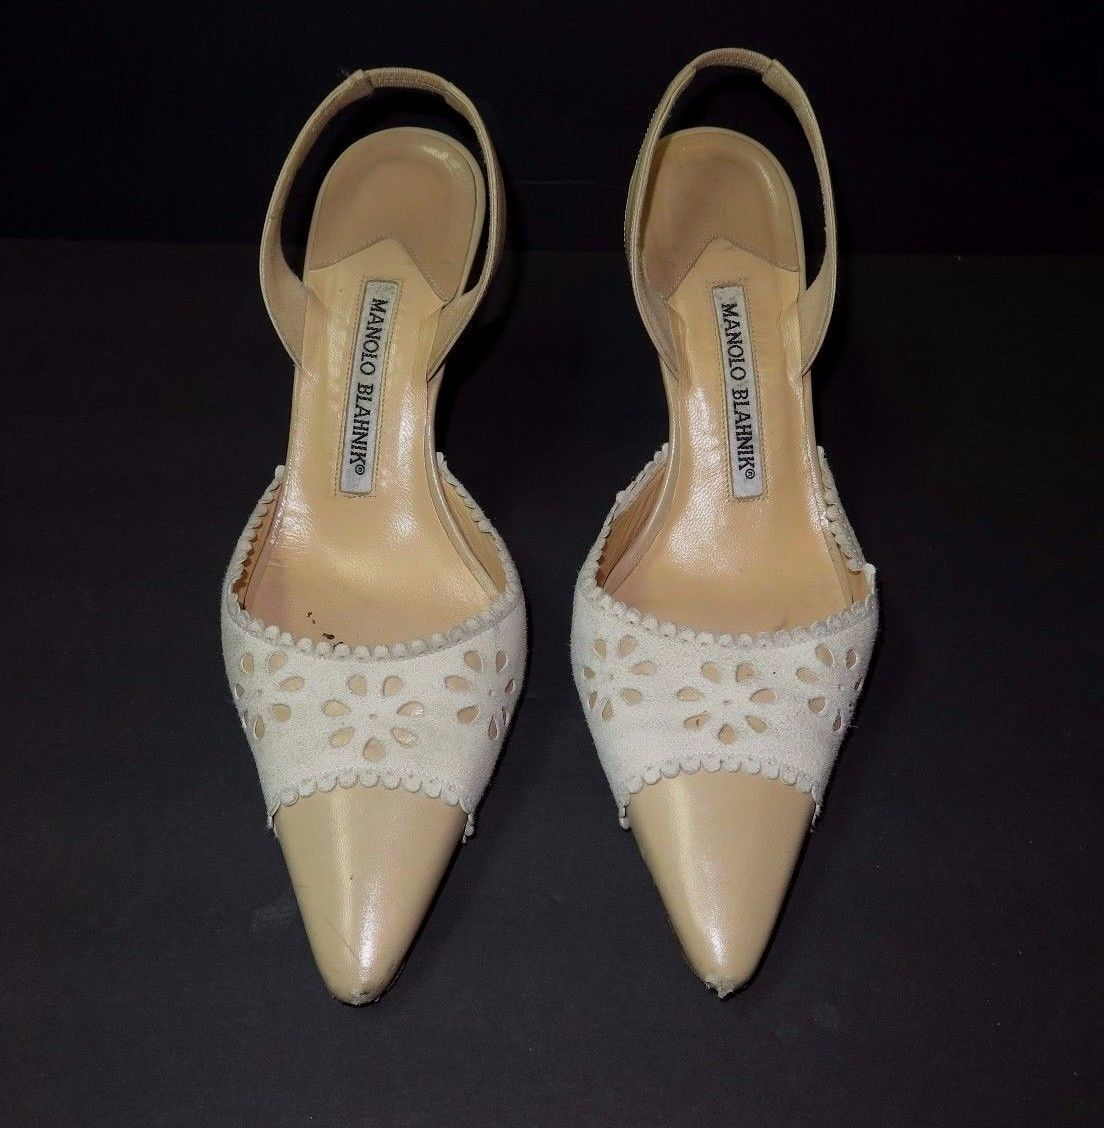 Diseñador Diseñador Diseñador Manolo Blahnik señoras Suede & Leather Slingback zapatos 36-1 2 Italia 409b39